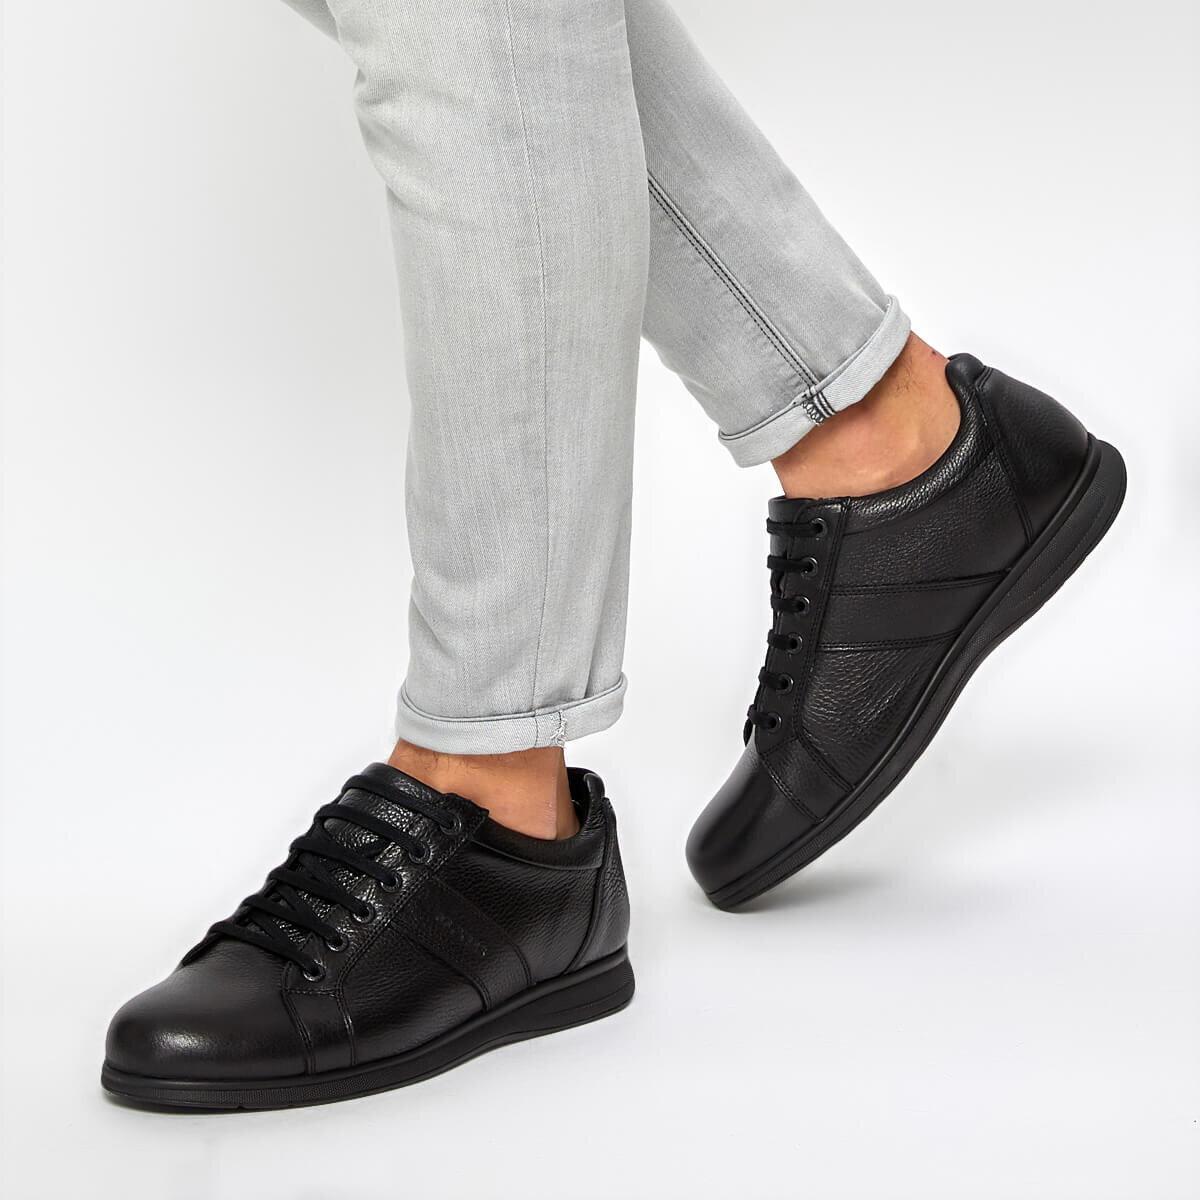 FLO 225051 9PR Black Men Casual Shoes By Dockers The Gerle